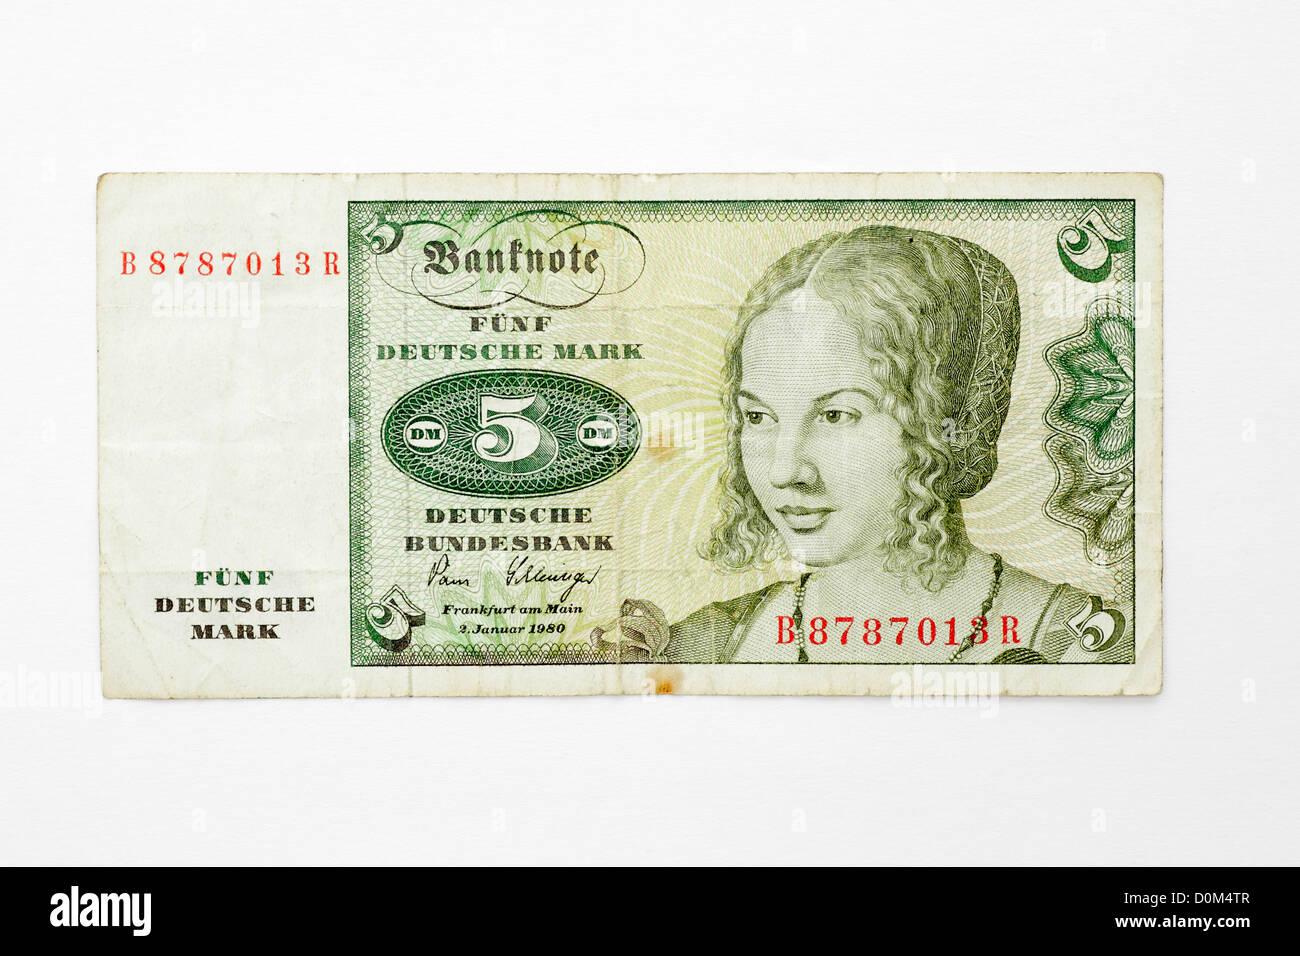 Five Deutsche Mark German Germany banknote funf money 5 DM DEM D-Mark marks Stock Photo